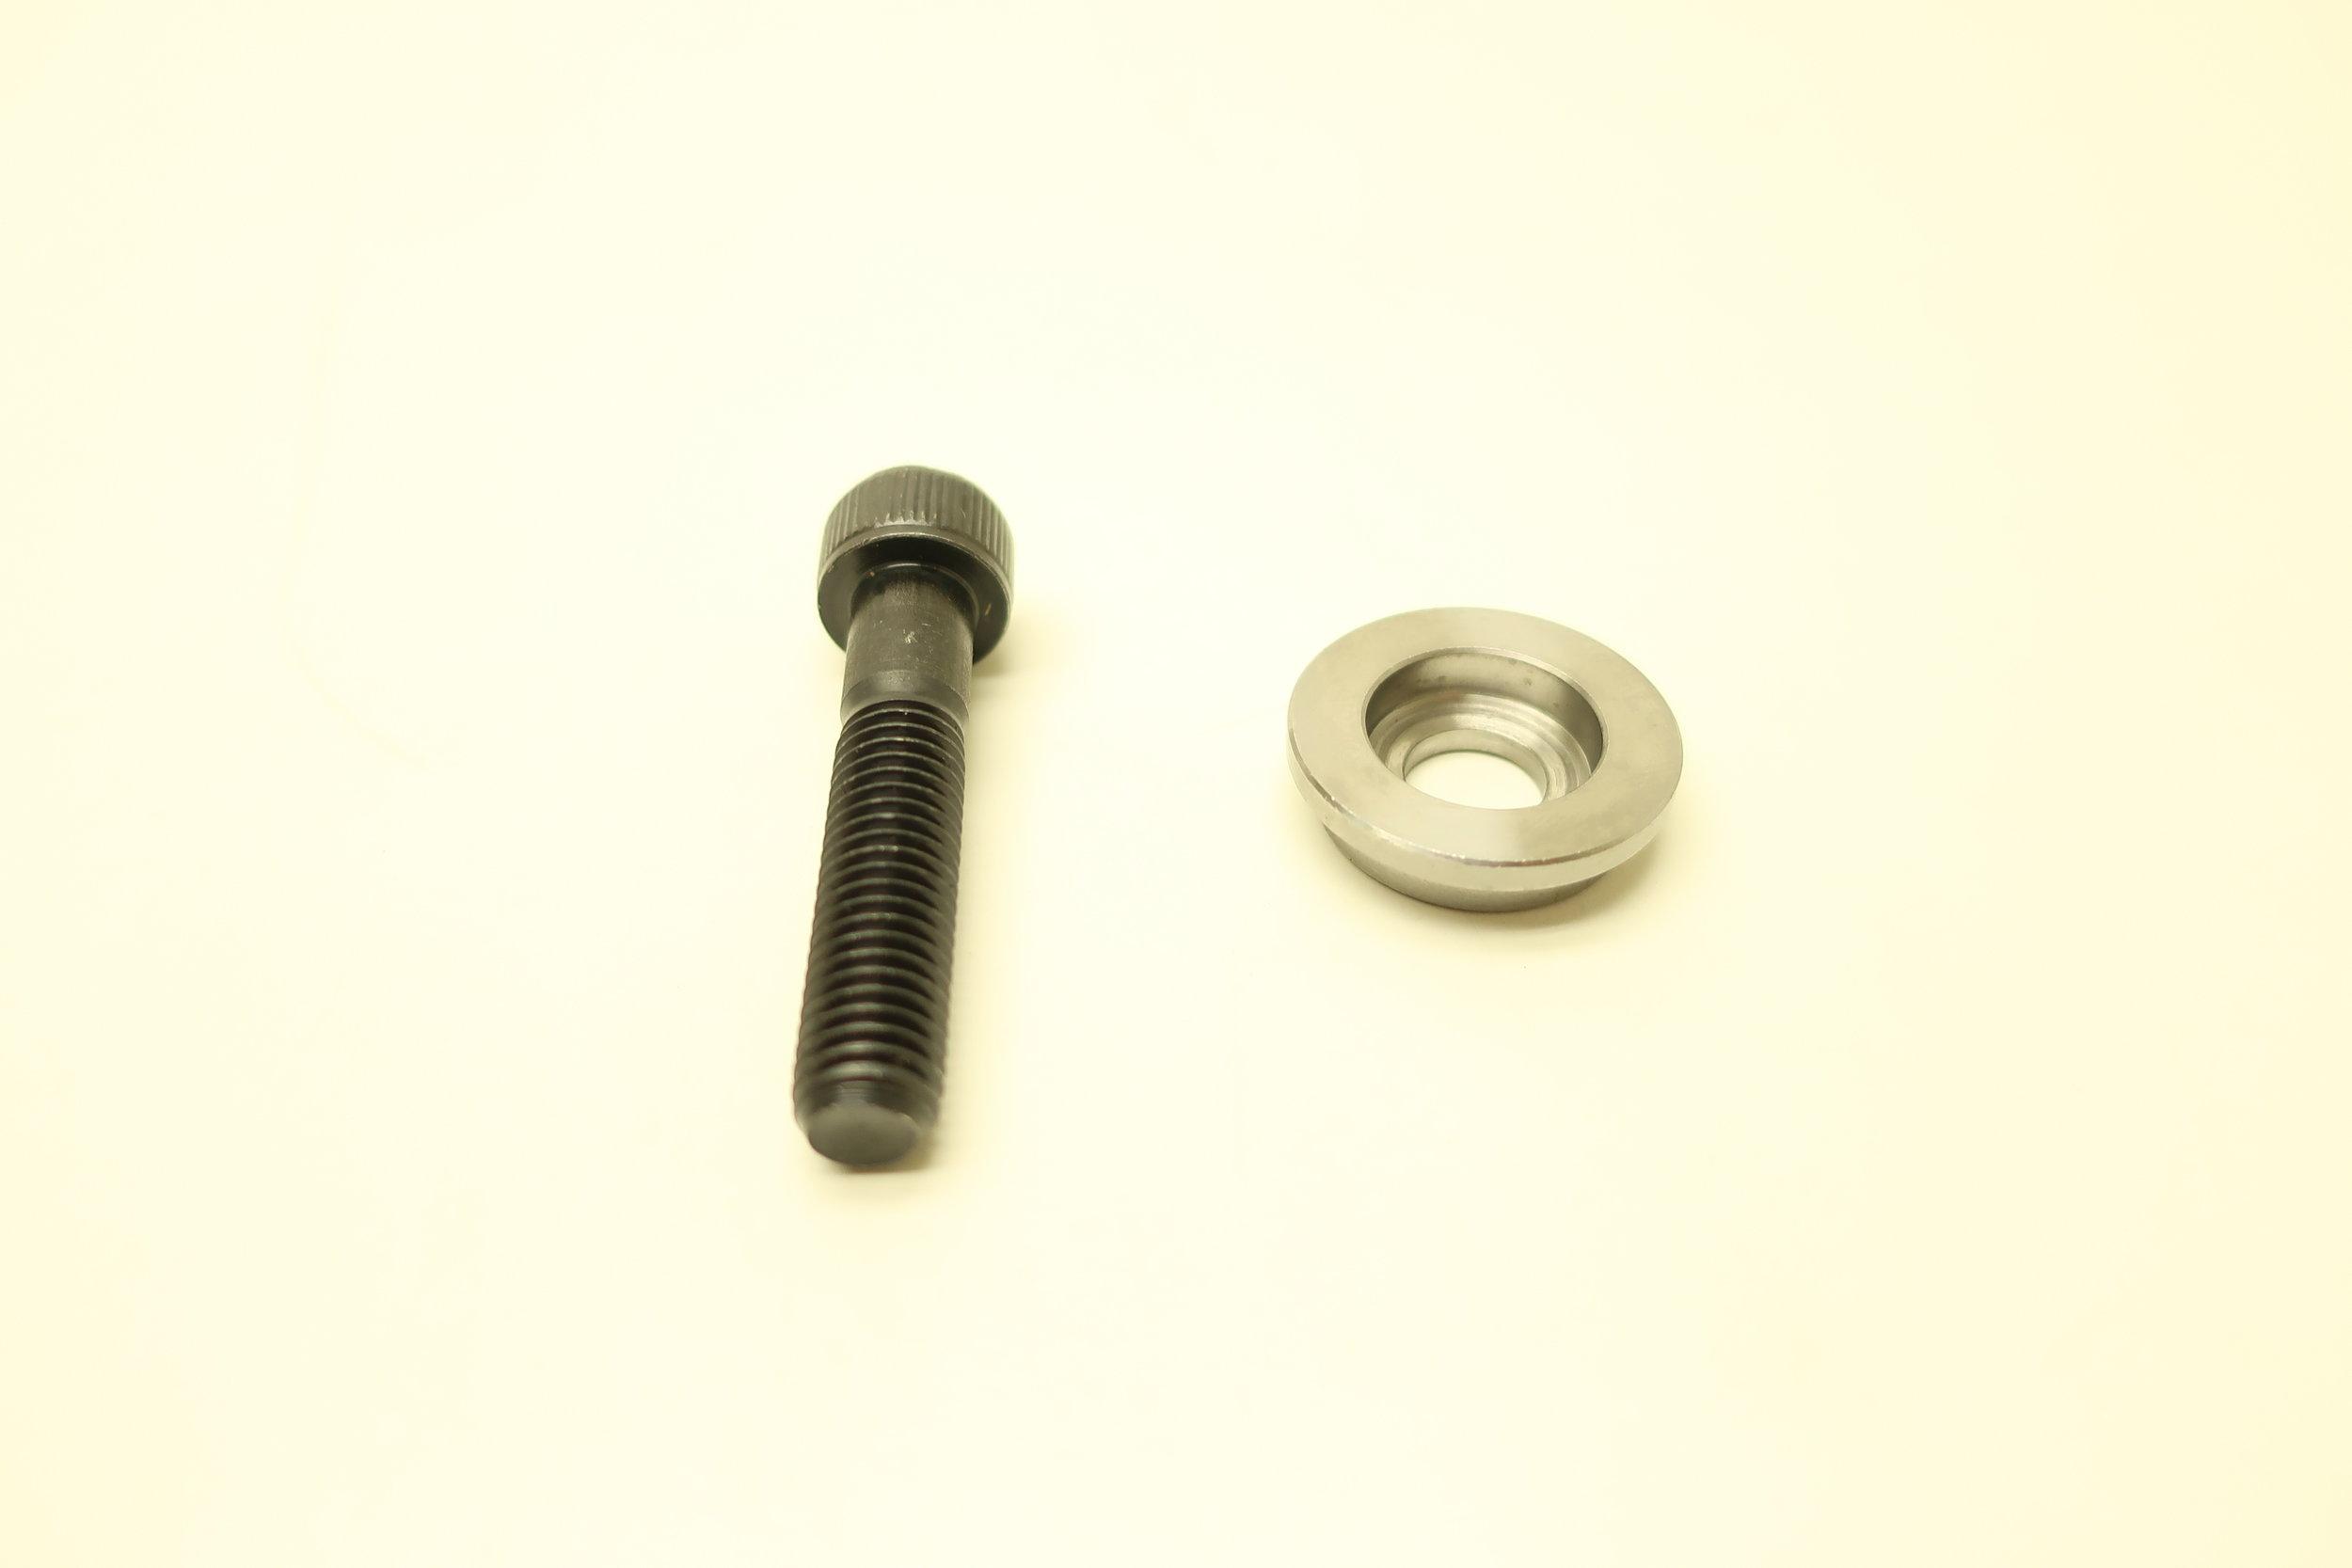 Road wheel Bolt and Washer Häggo Nr: 2121 2541-501 (bolt) Häggo Nr: 453 6522-001 (Washer) Price: